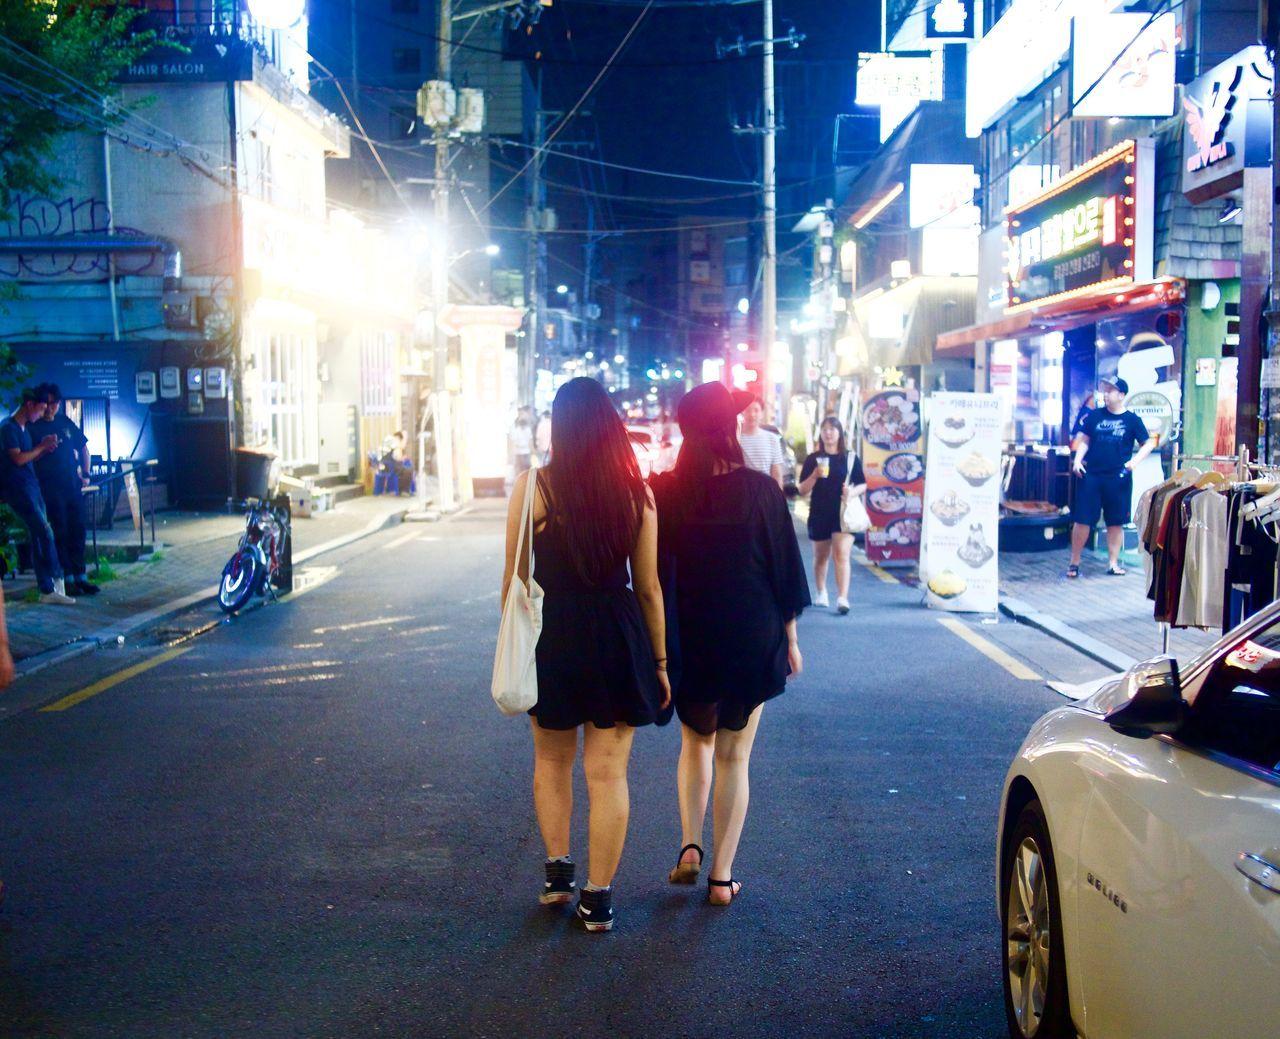 City City Life City Street Exploring The City Streets Girls Exploring Hongik Illuminated Night South Korea